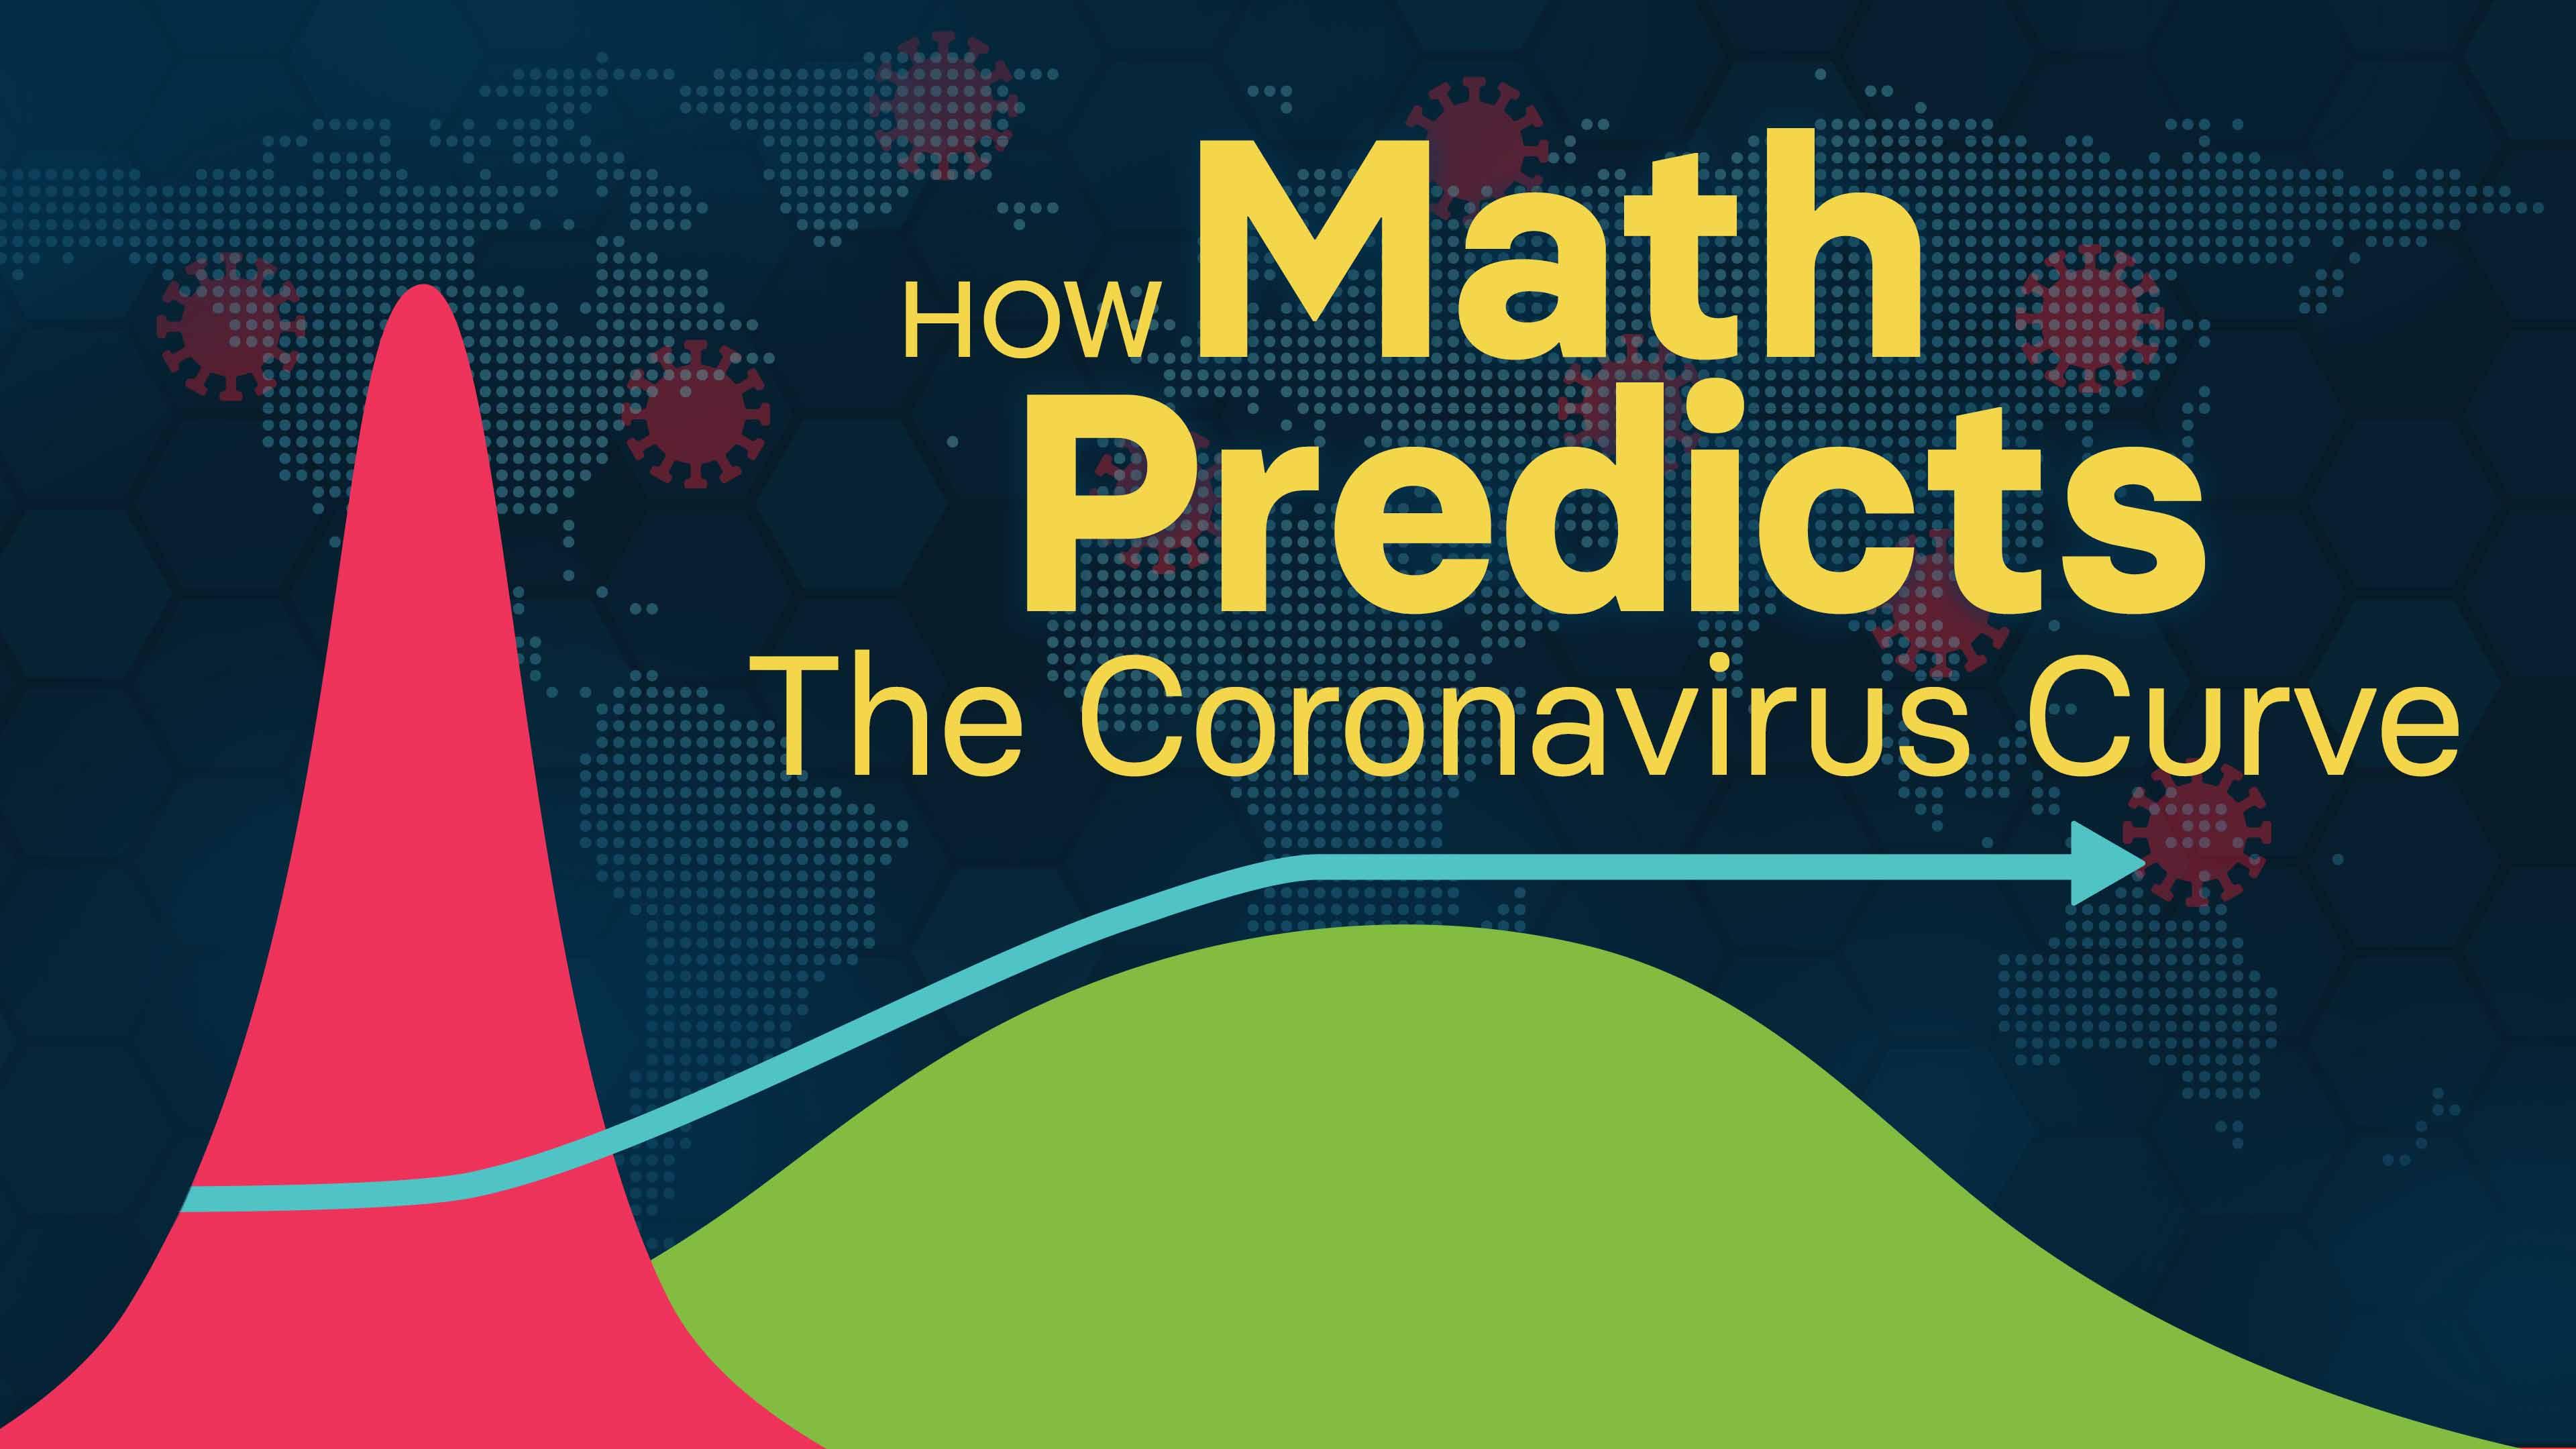 How Math Predicts the Coronavirus Curve